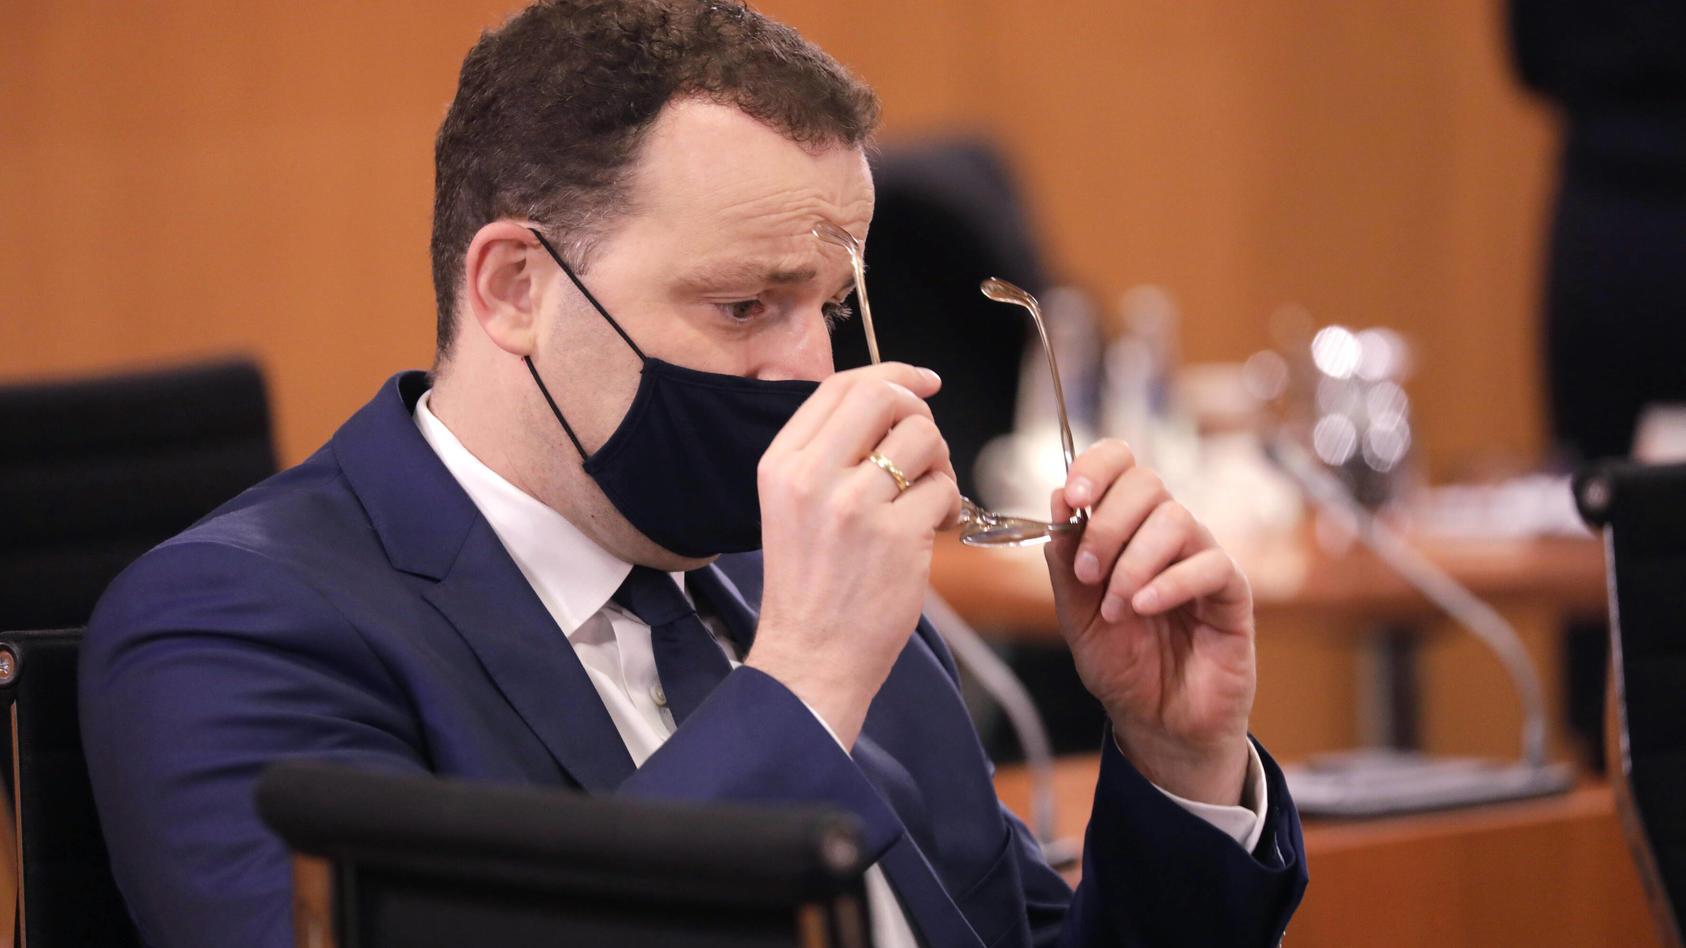 Jens Spahn, Bundesminister fuer Gesundheit, CDU, Bundeskabinett, DEU, Berlin, 21.10.2020 *** Jens Spahn, Federal Ministe